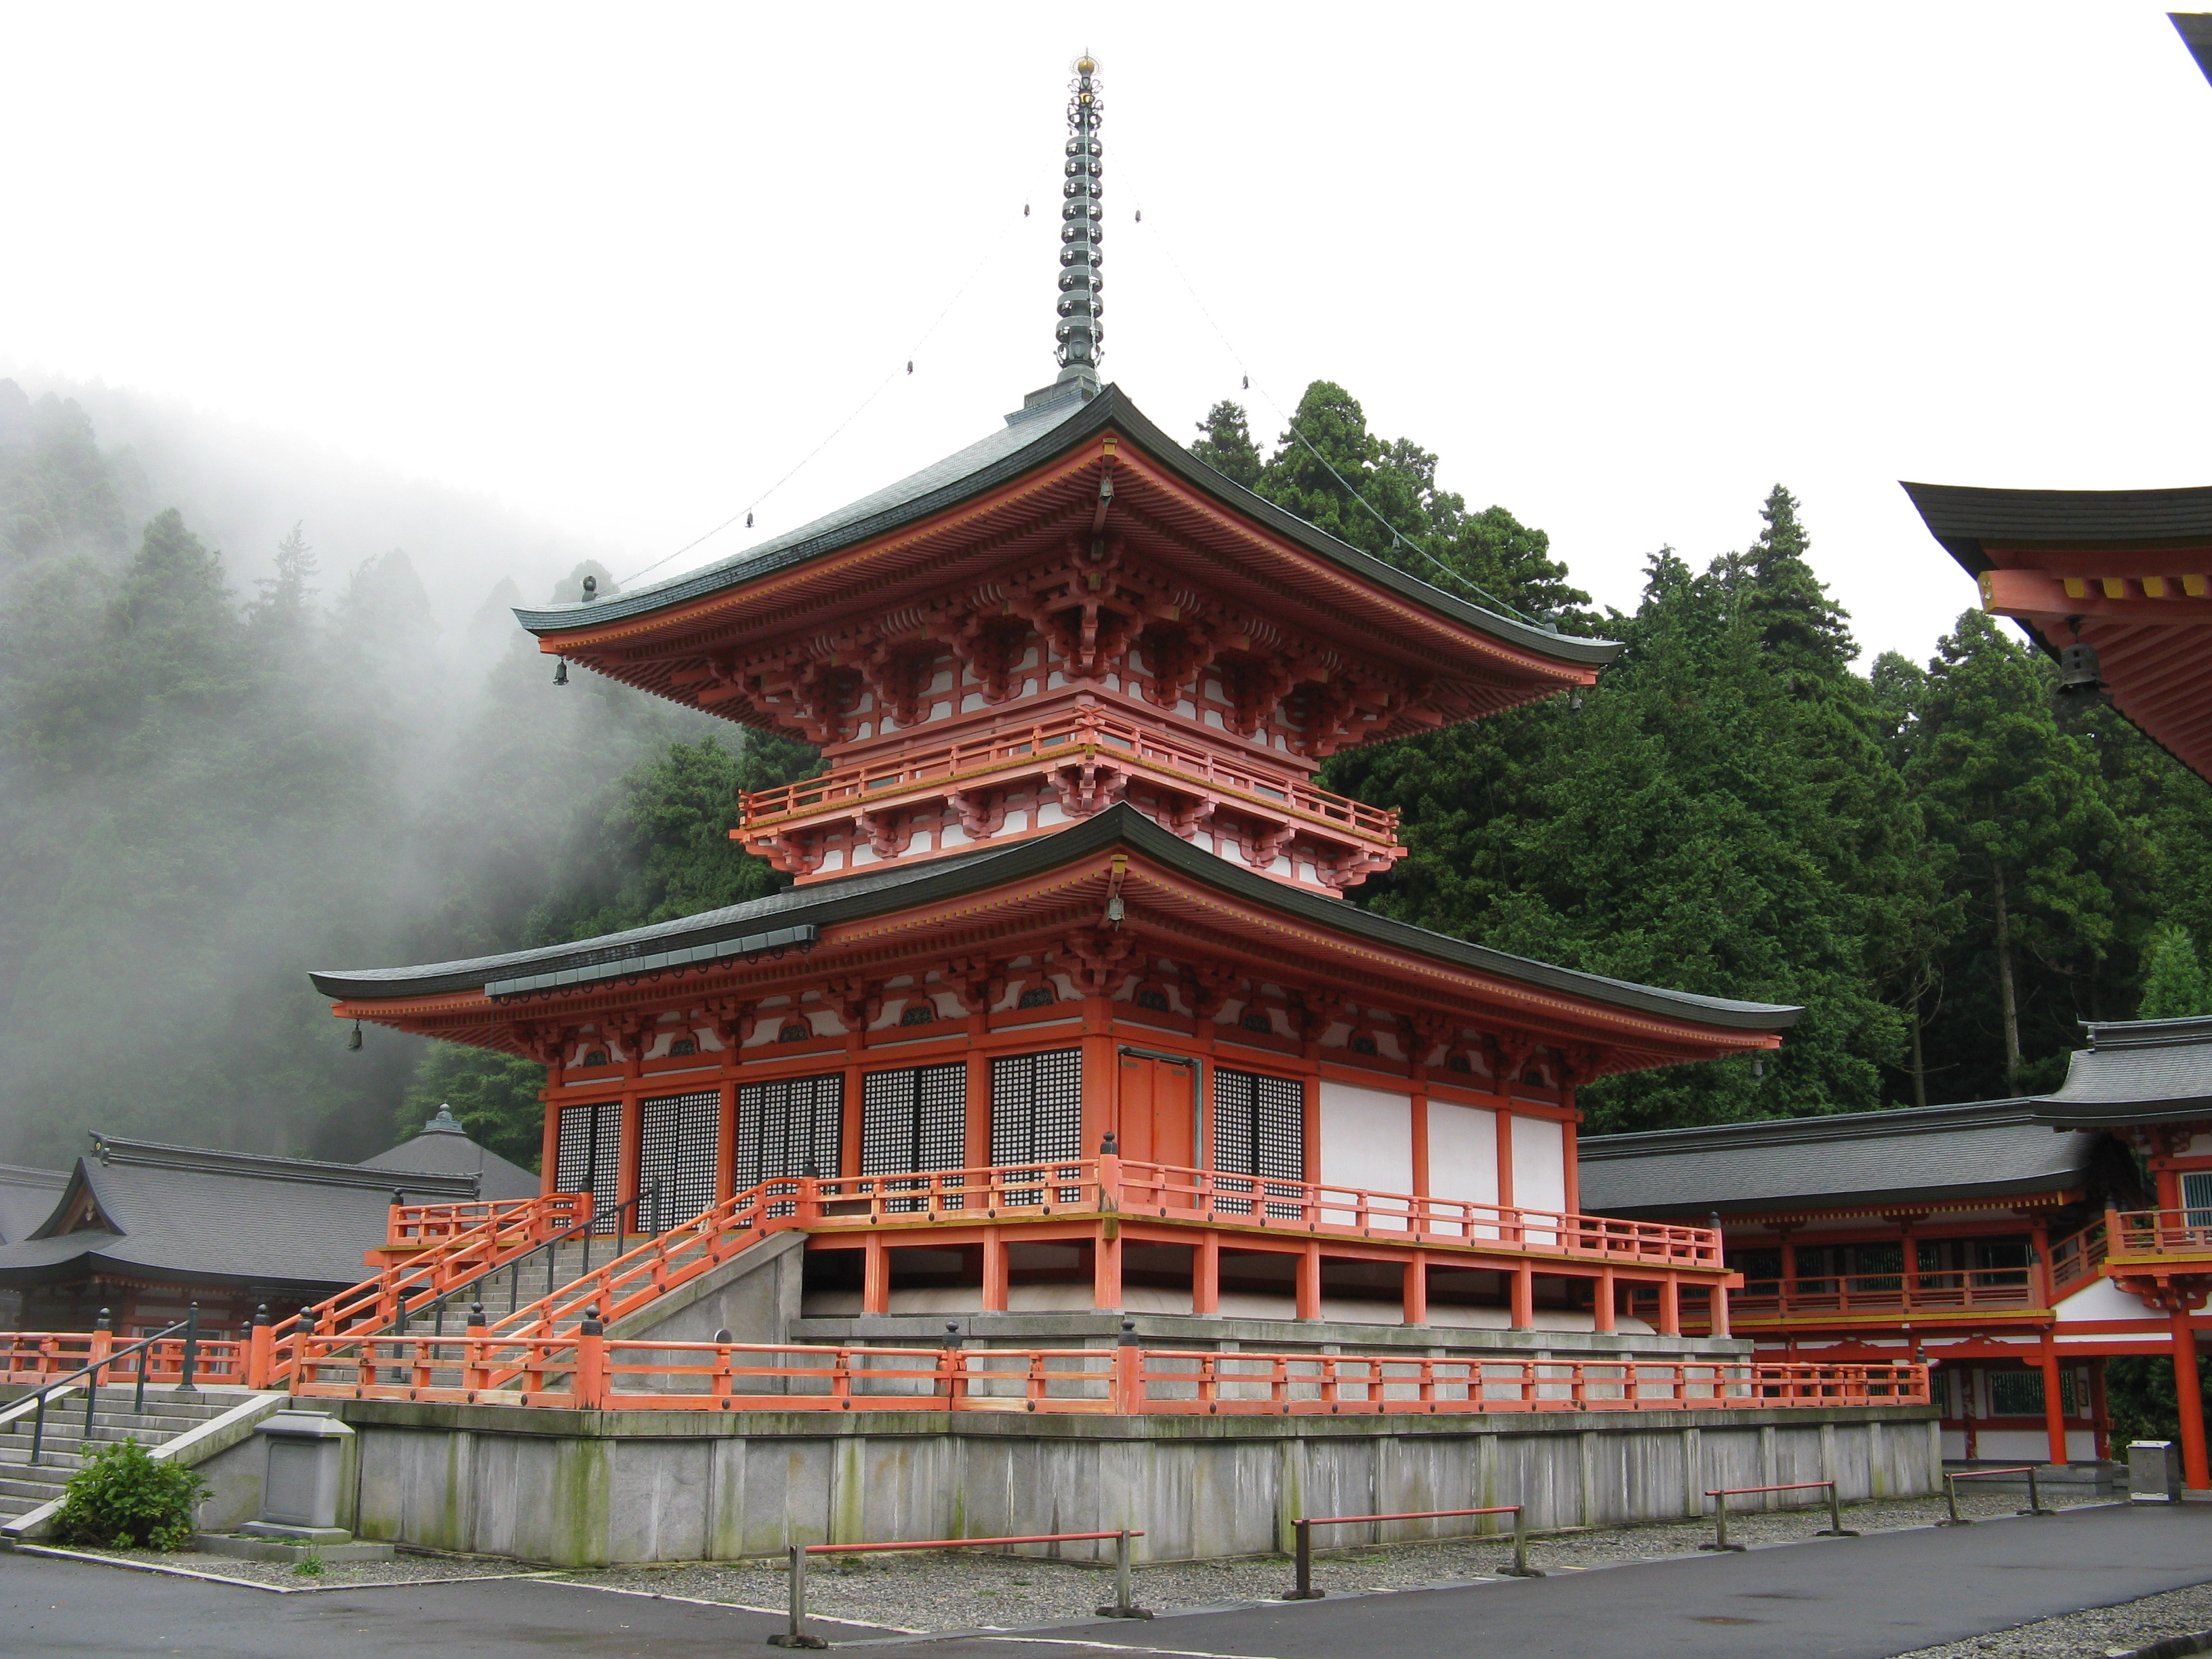 http://upload.wikimedia.org/wikipedia/commons/0/01/Enryakuji_Todo.jpg